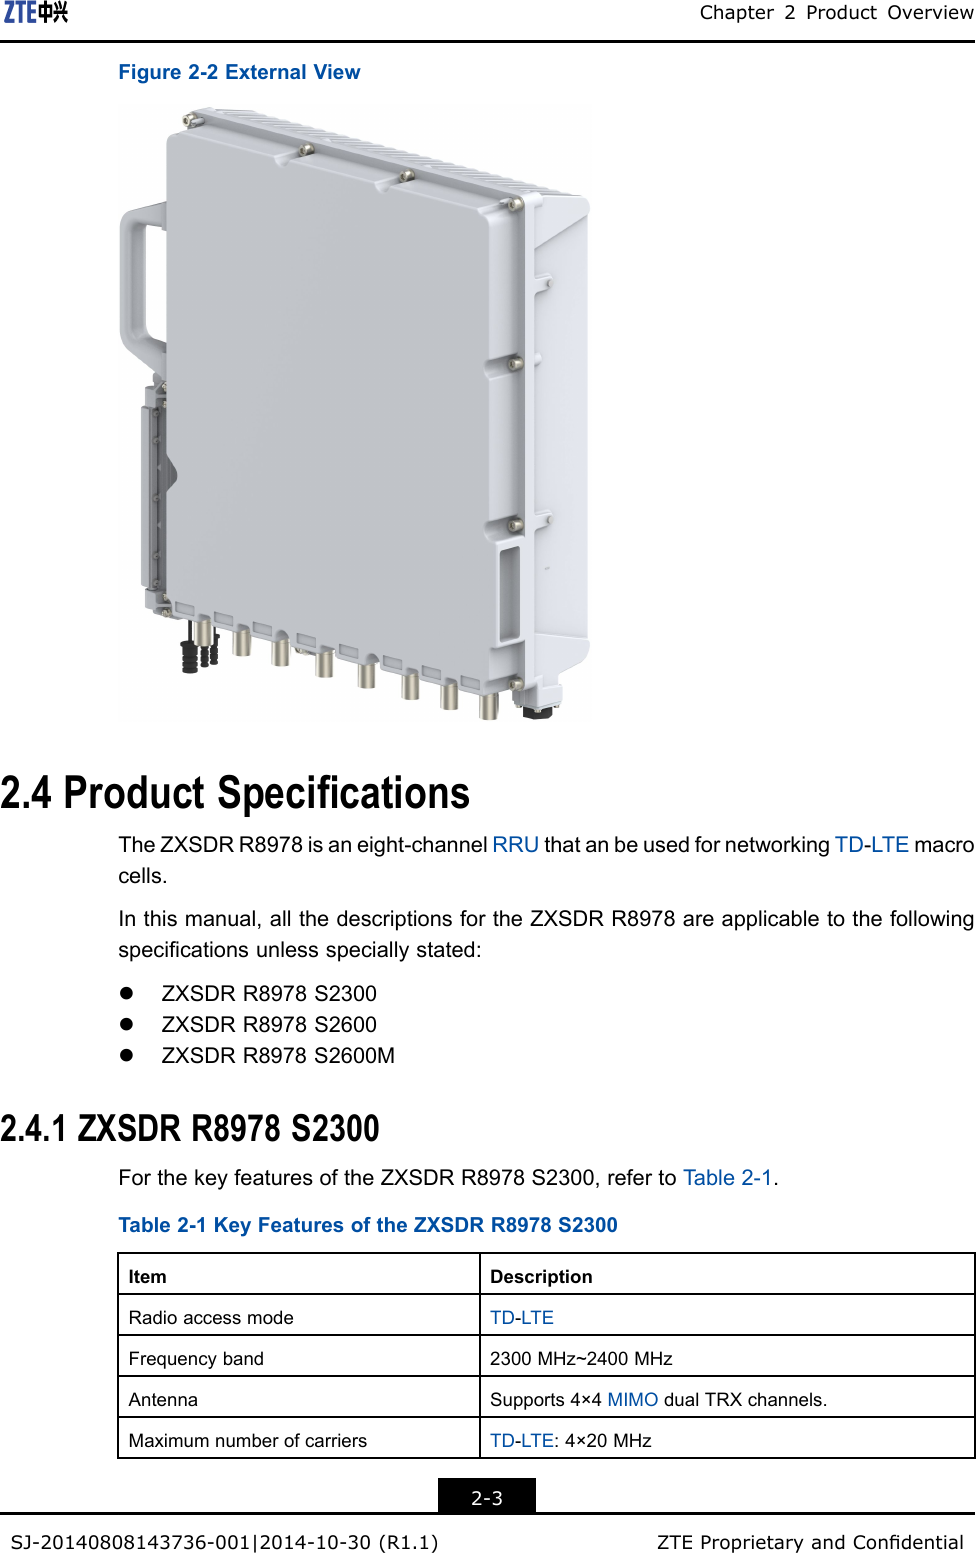 ZTE R8978S2600M LTE TDD RRU User Manual ZXSDR R8978 TDD 8